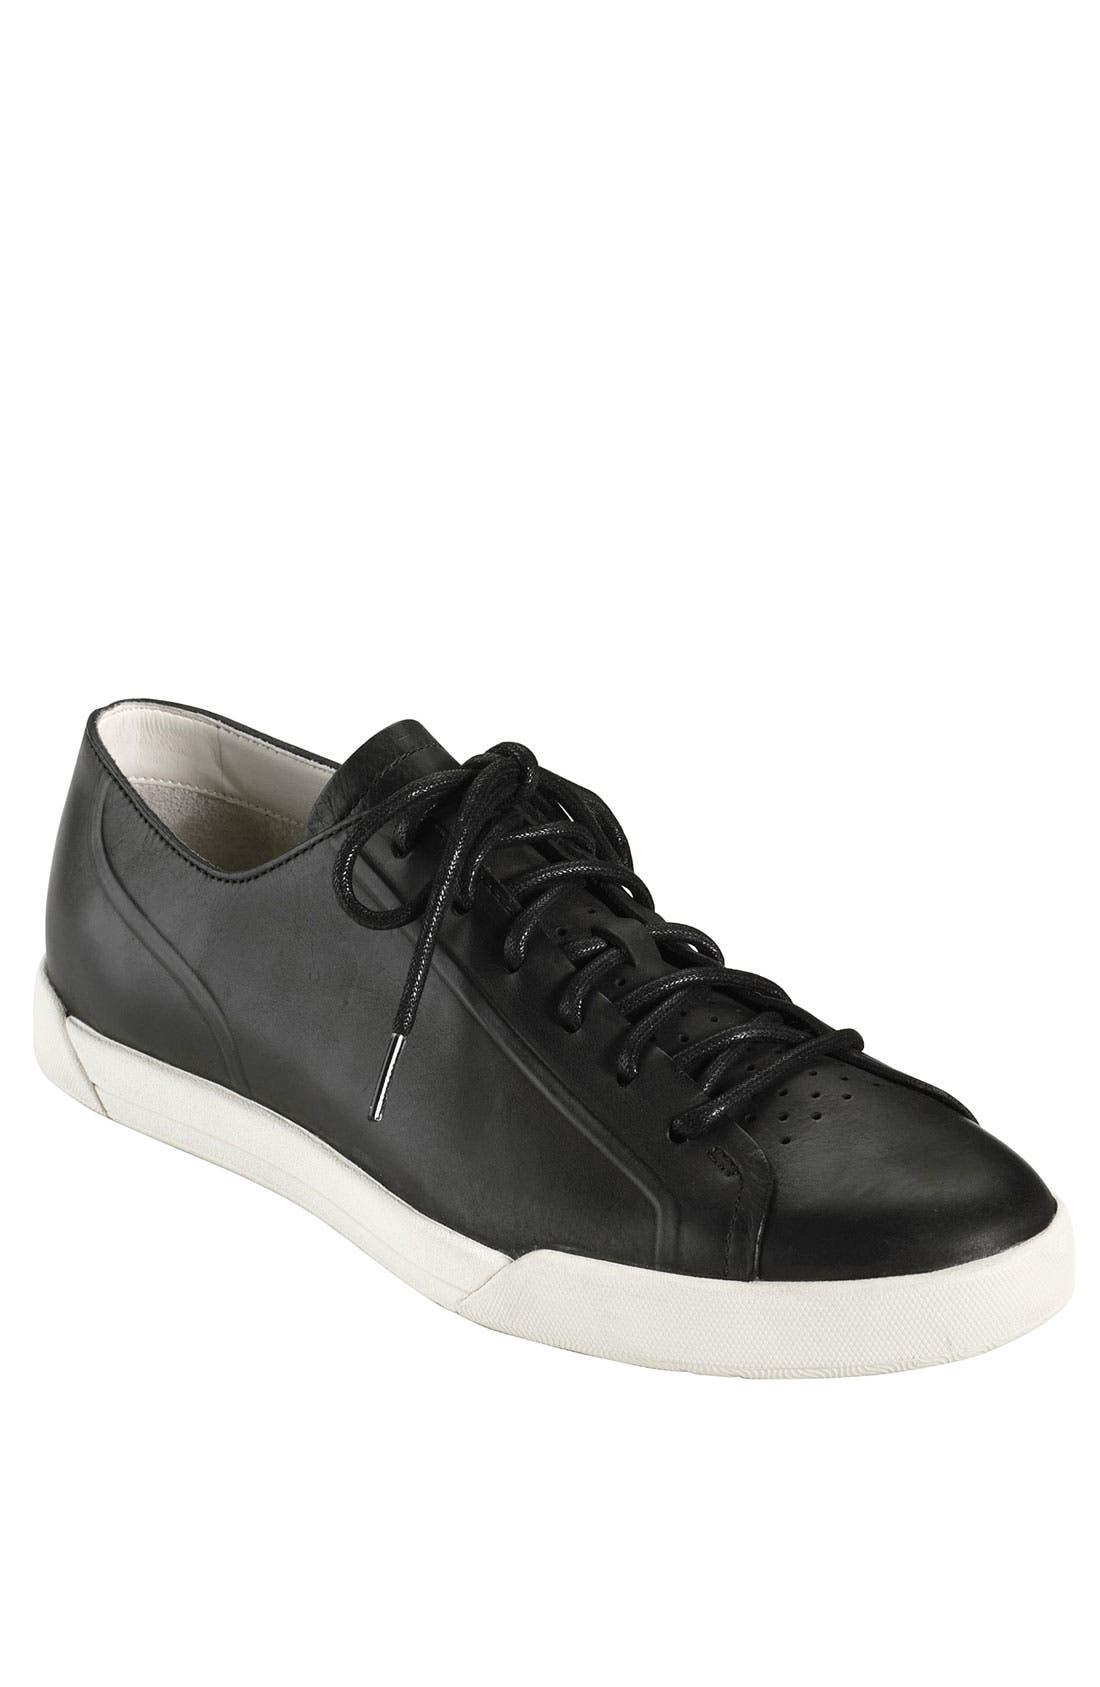 Alternate Image 1 Selected - Cole Haan 'Air Jasper Low' Sneaker